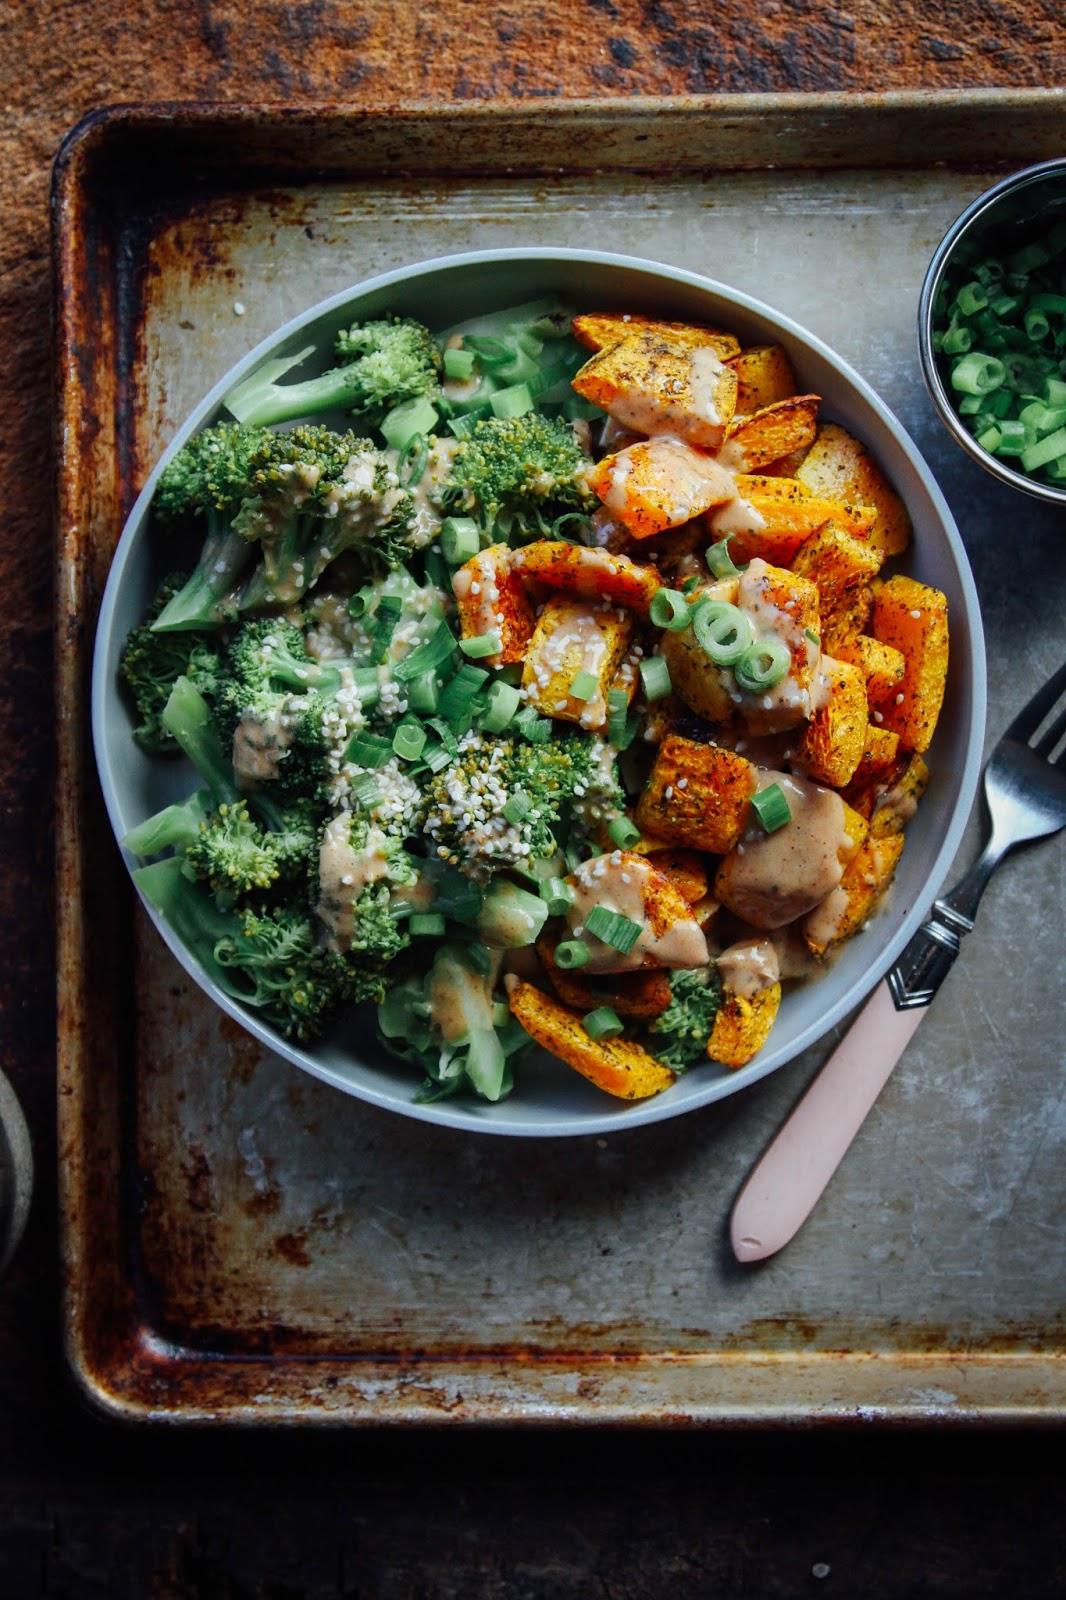 ... Vegan Life: CREAMY BUTTERNUT SQUASH, BROCCOLI + CHIPOTLE ALMOND SAUCE